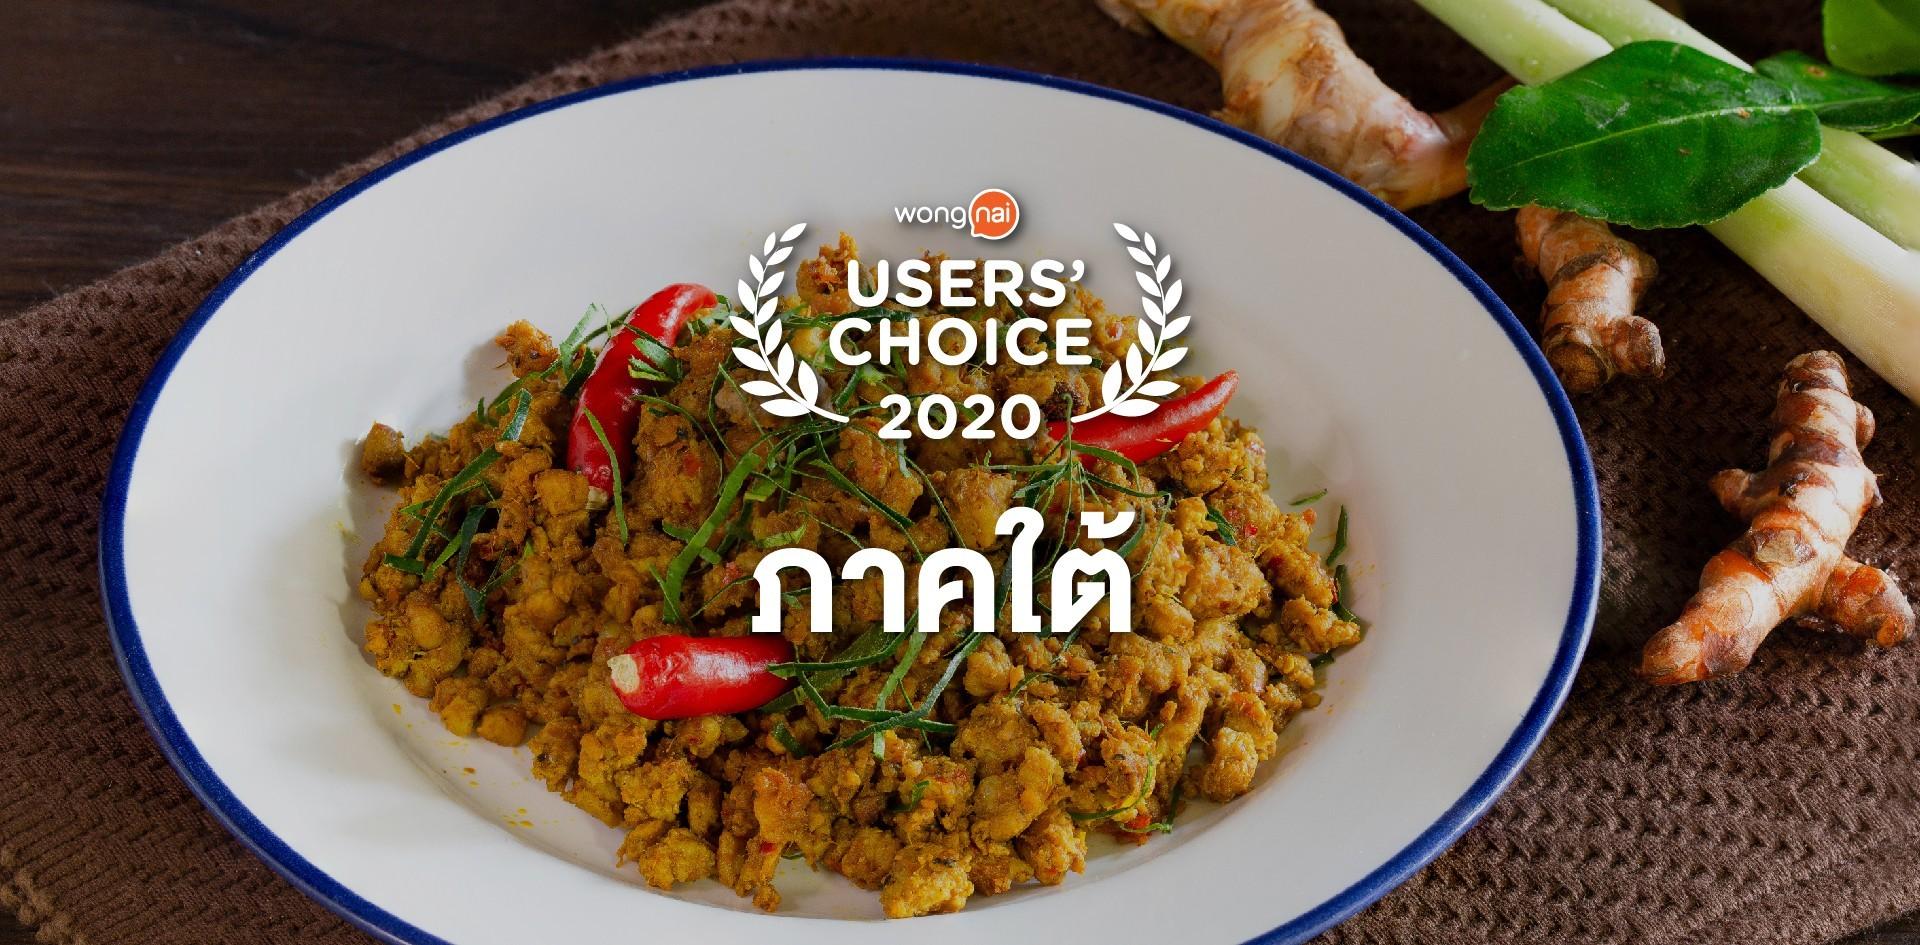 [Users' Choice 2020] ร้านอาหารภาคใต้